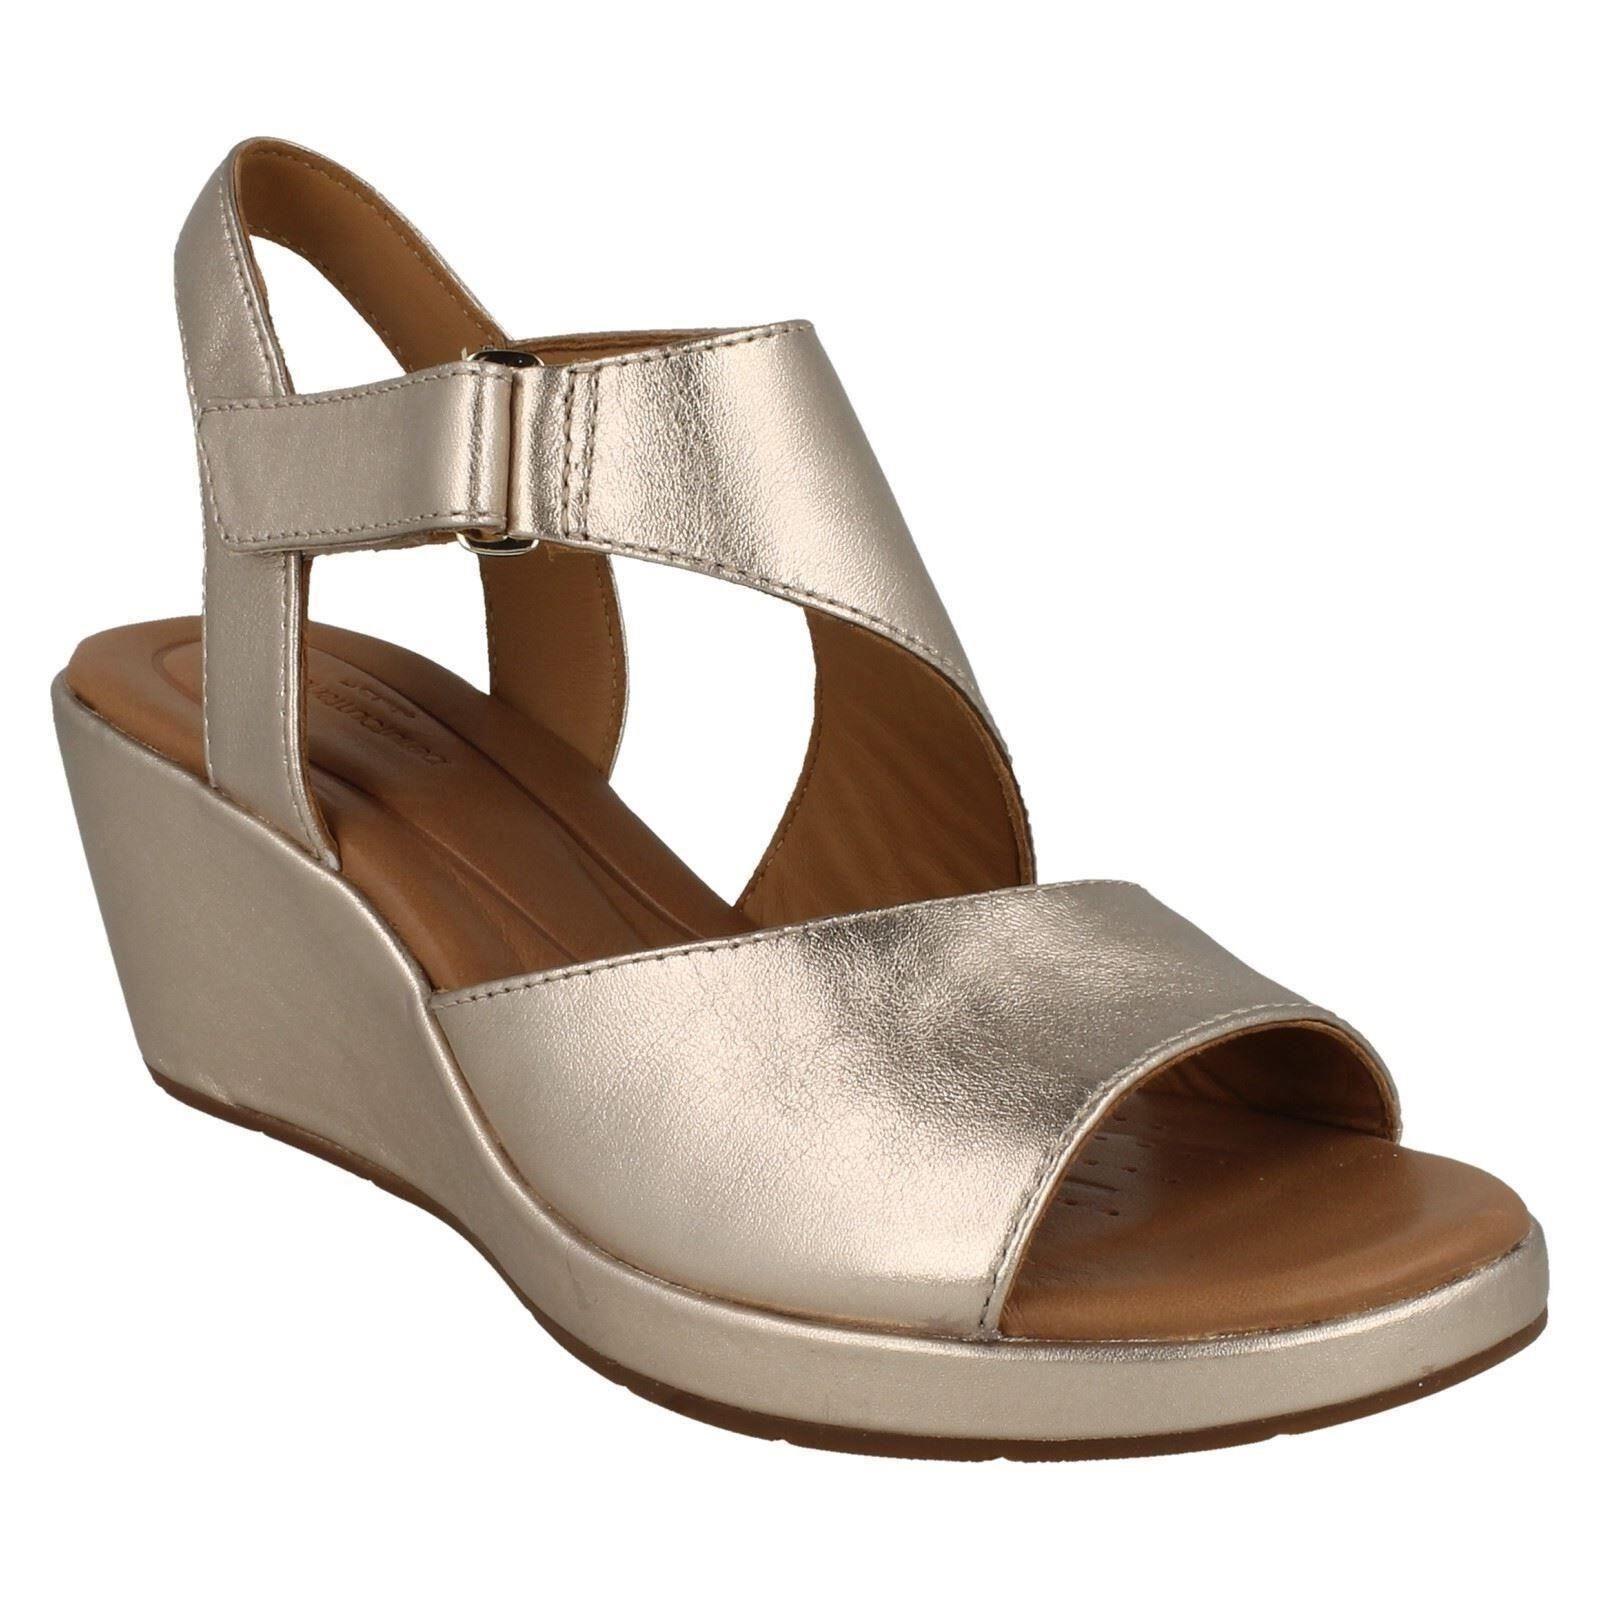 Damen Clarks Unstrukturiert Leder Keilabsatz Sommer Sandale Größe Un Plaza